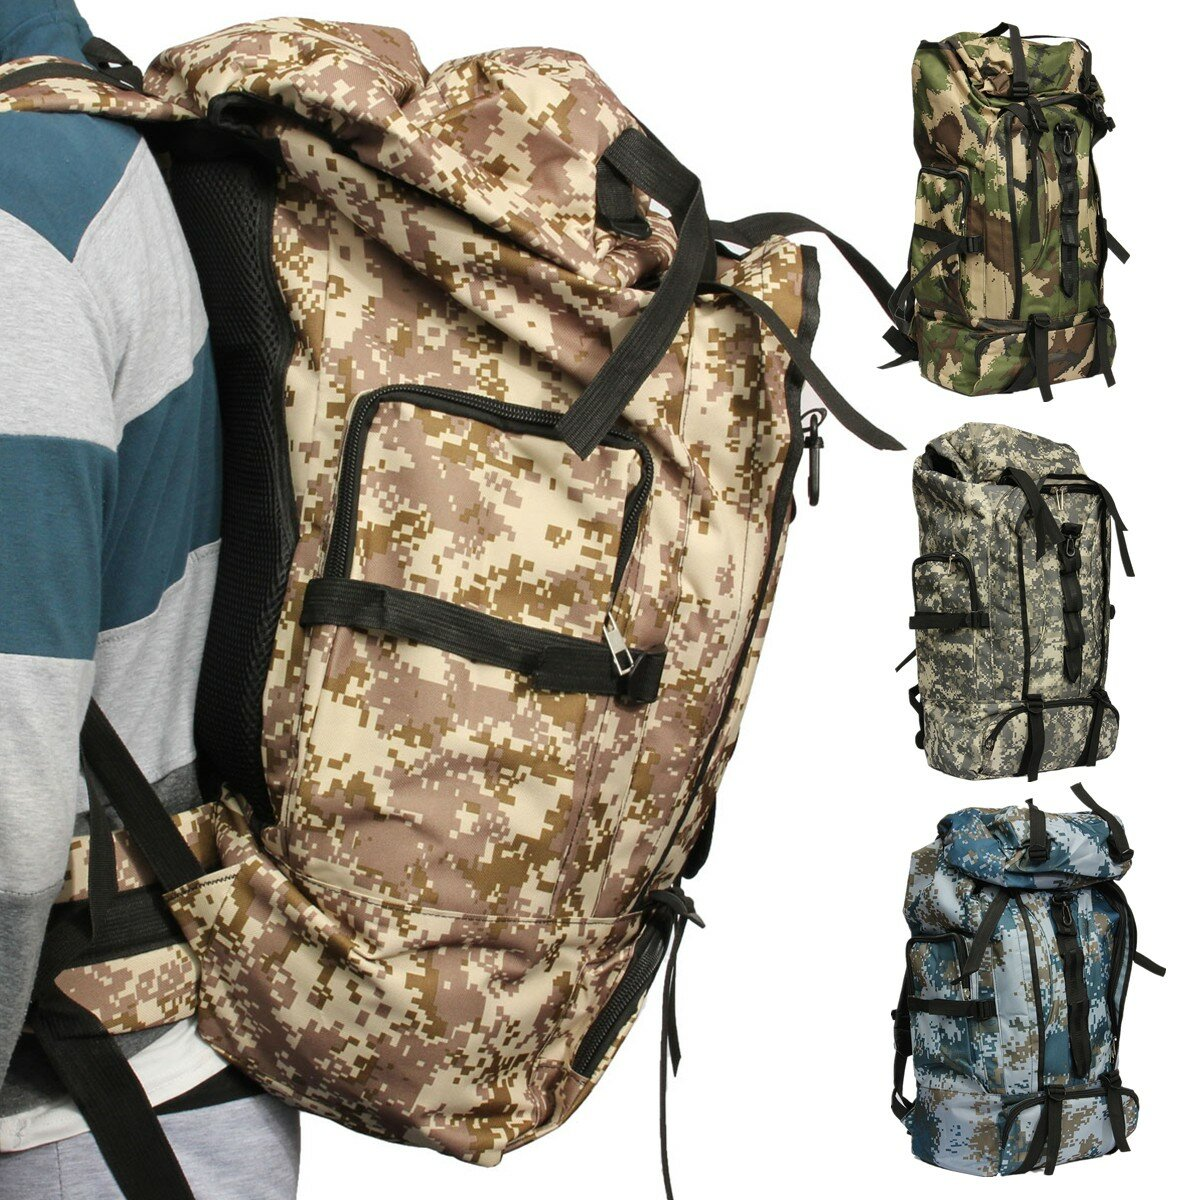 80L Big Capacity Travel Backpack Outdoor Nylon Sports Climbing Bag For Men